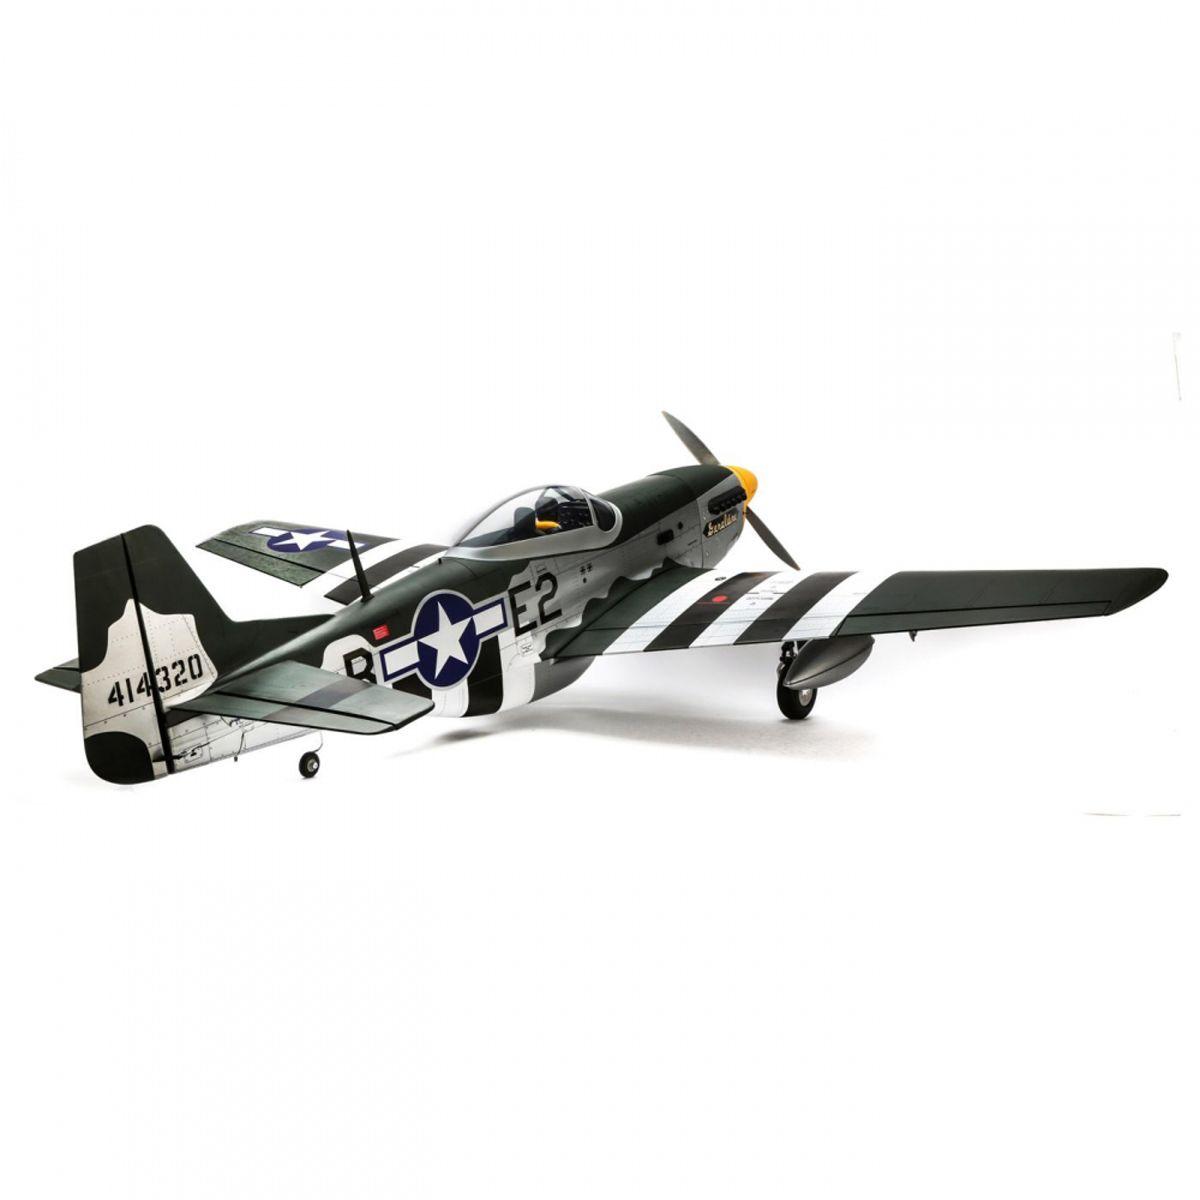 P-51D Mustang hangar 9